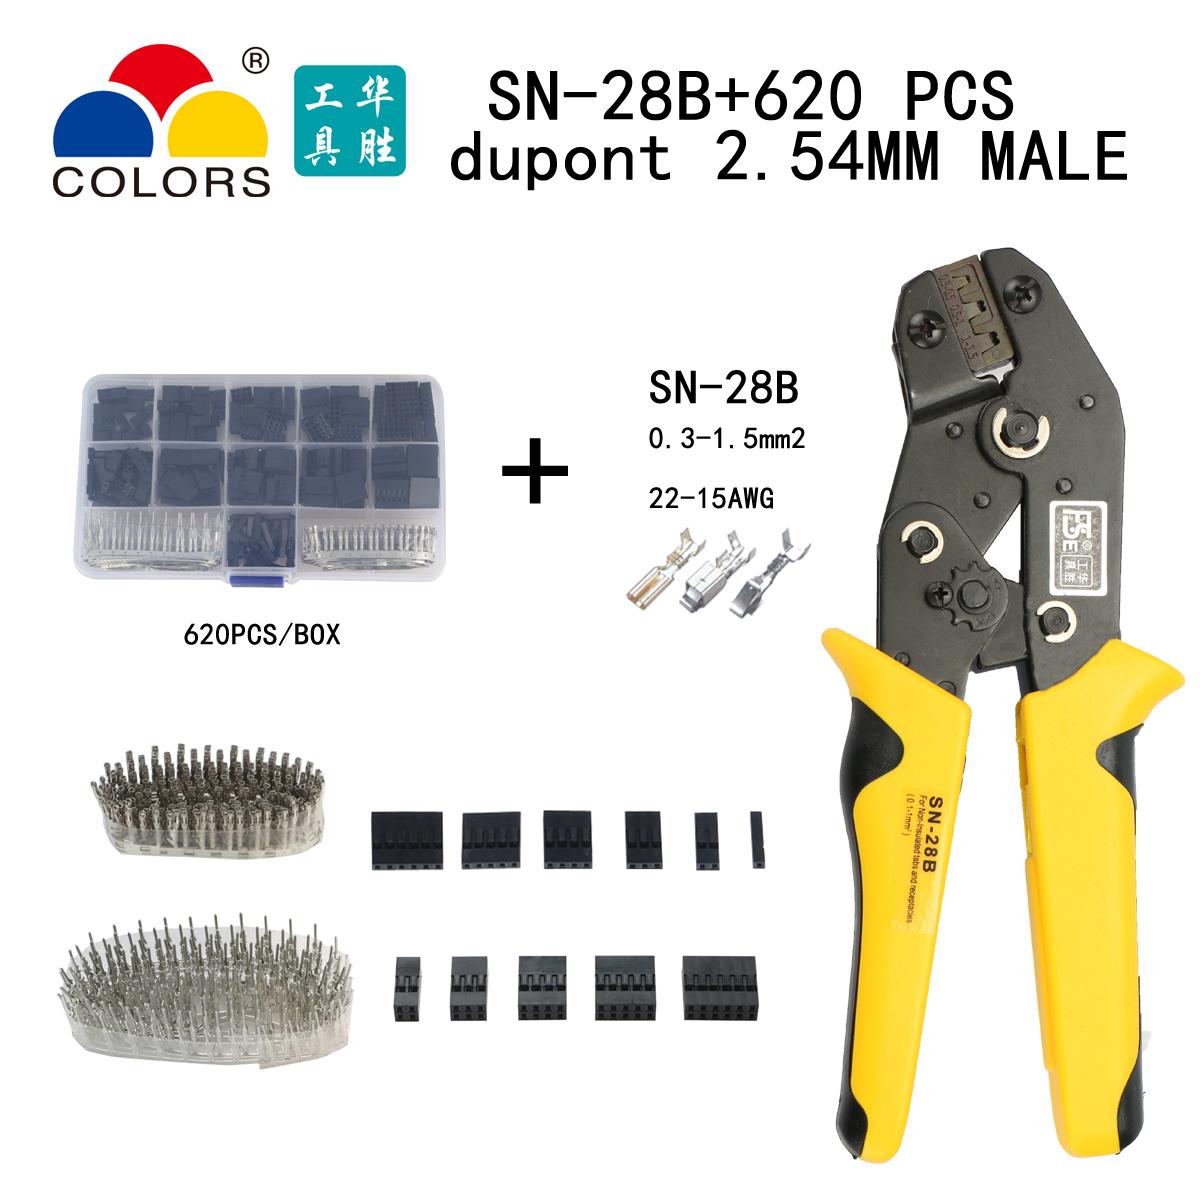 0.1-1mm 28-18AWG SN-28B Prensar Terminales Alicates para DuPont Pin Arrugador Herramienta